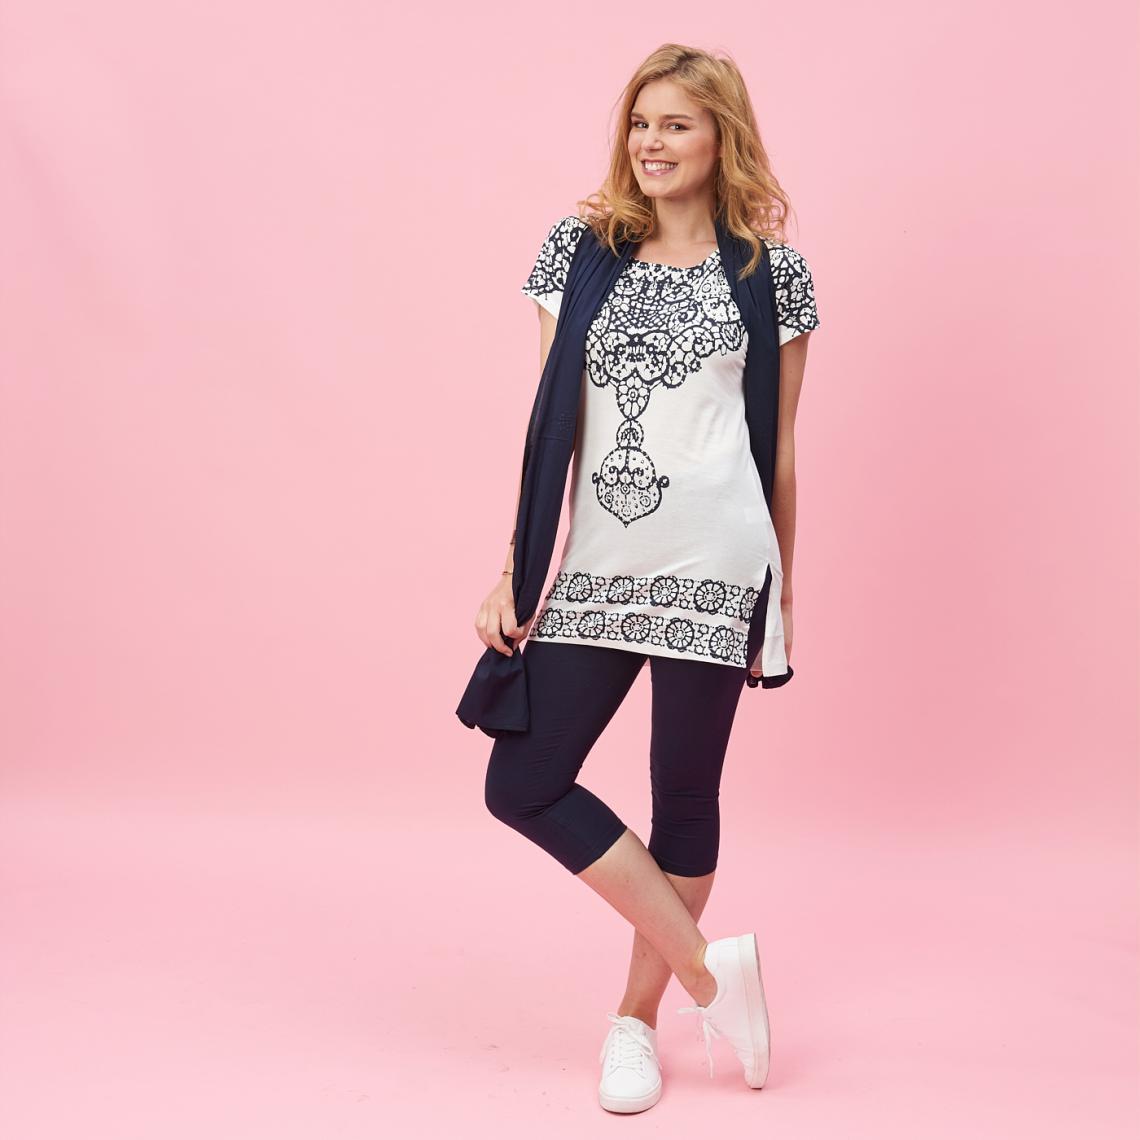 Ensemble tee-shirt, legging et foulard - Bleu - 3 SUISSES - Modalova